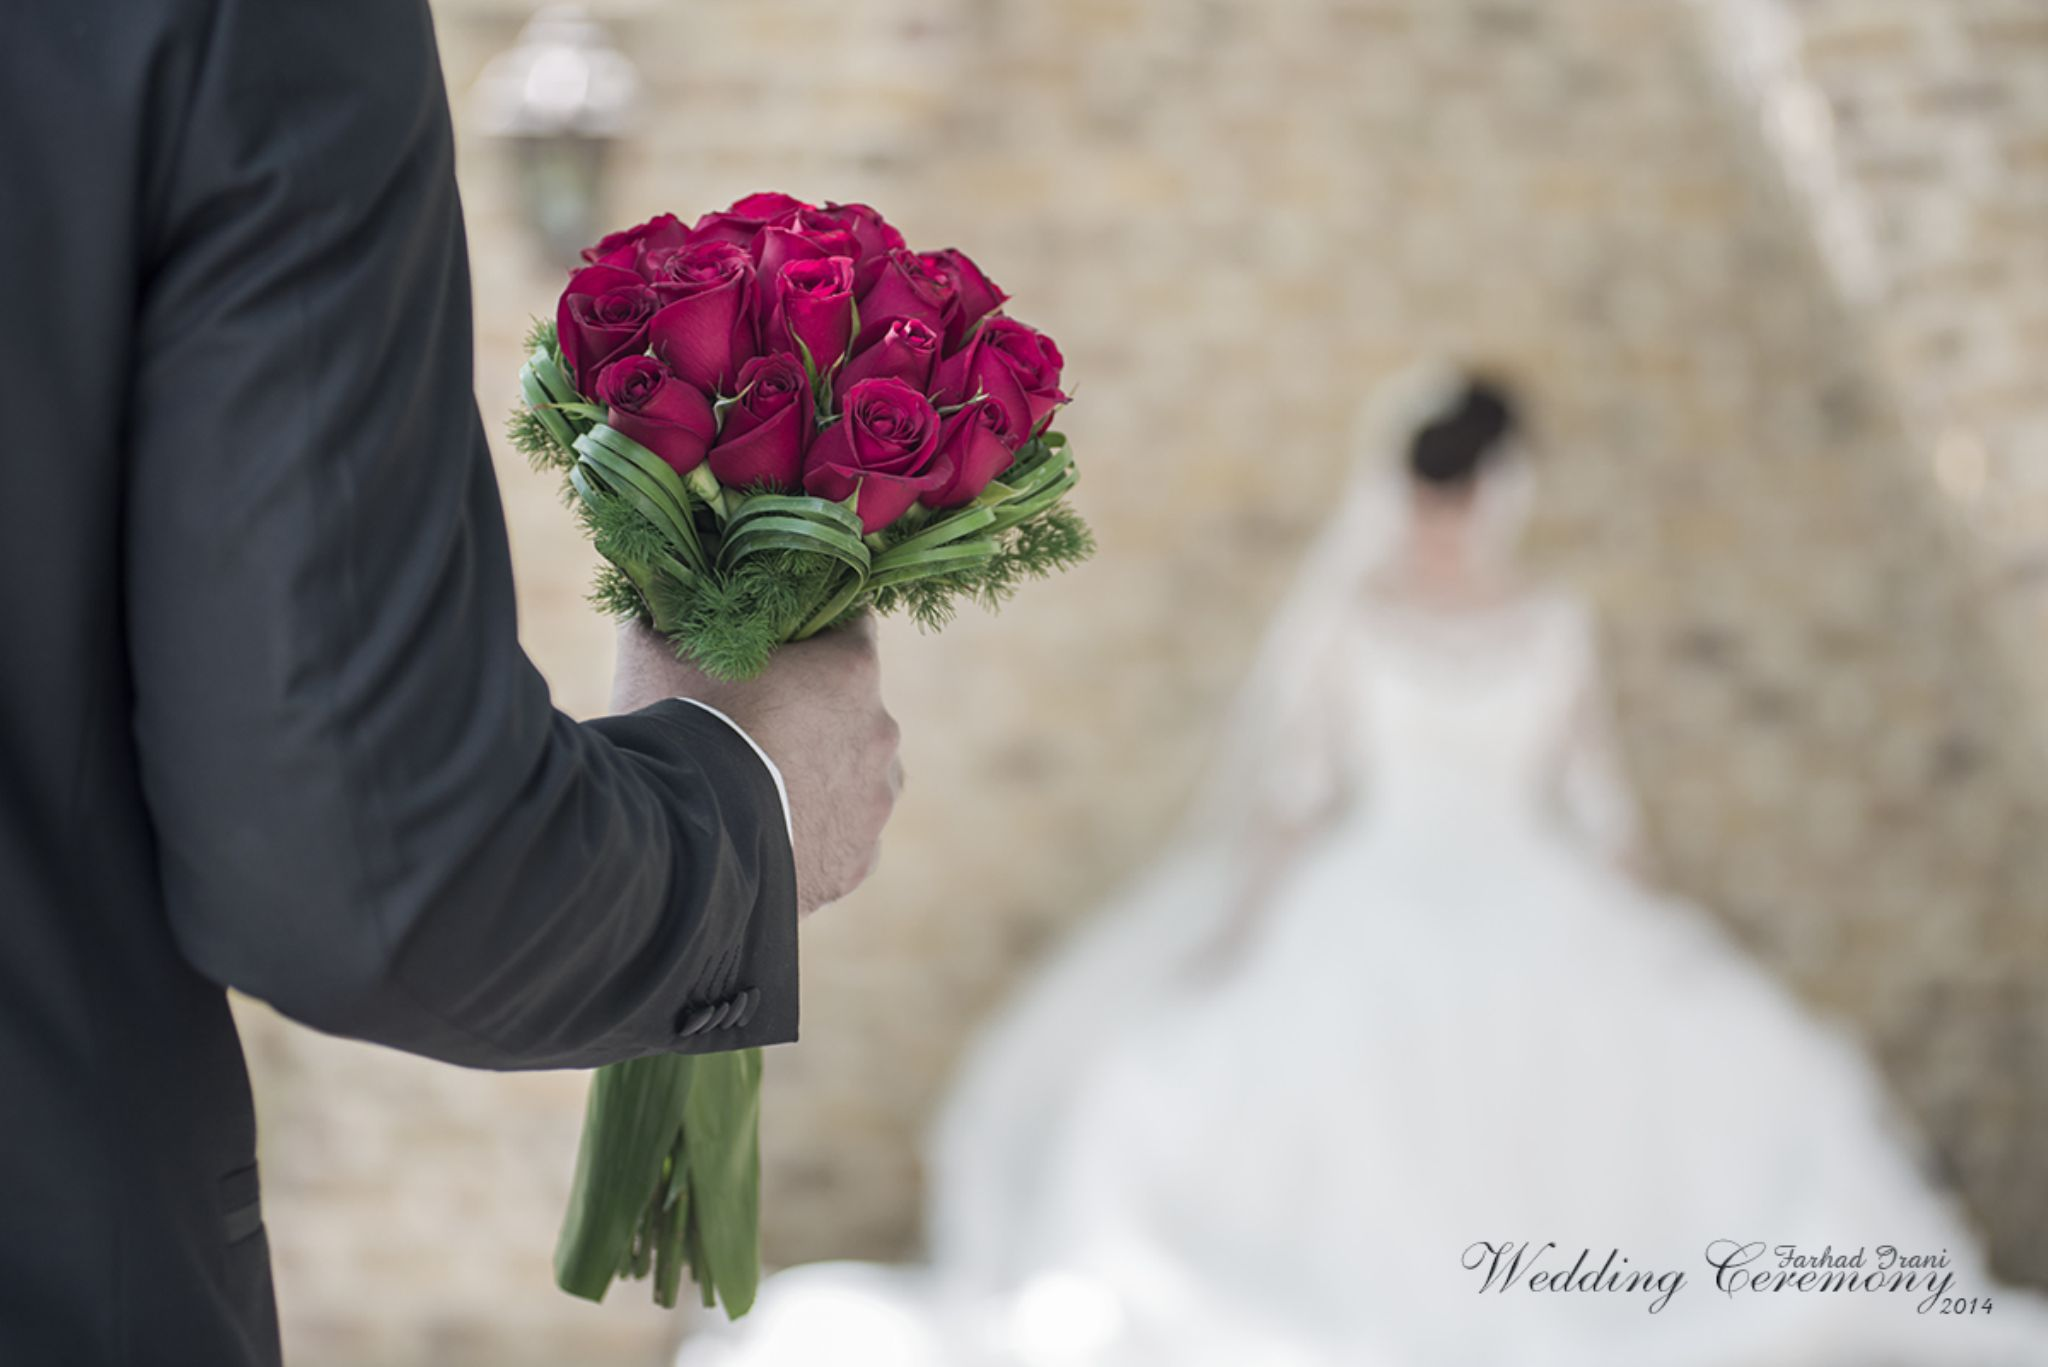 Wedding by Farhad Irani